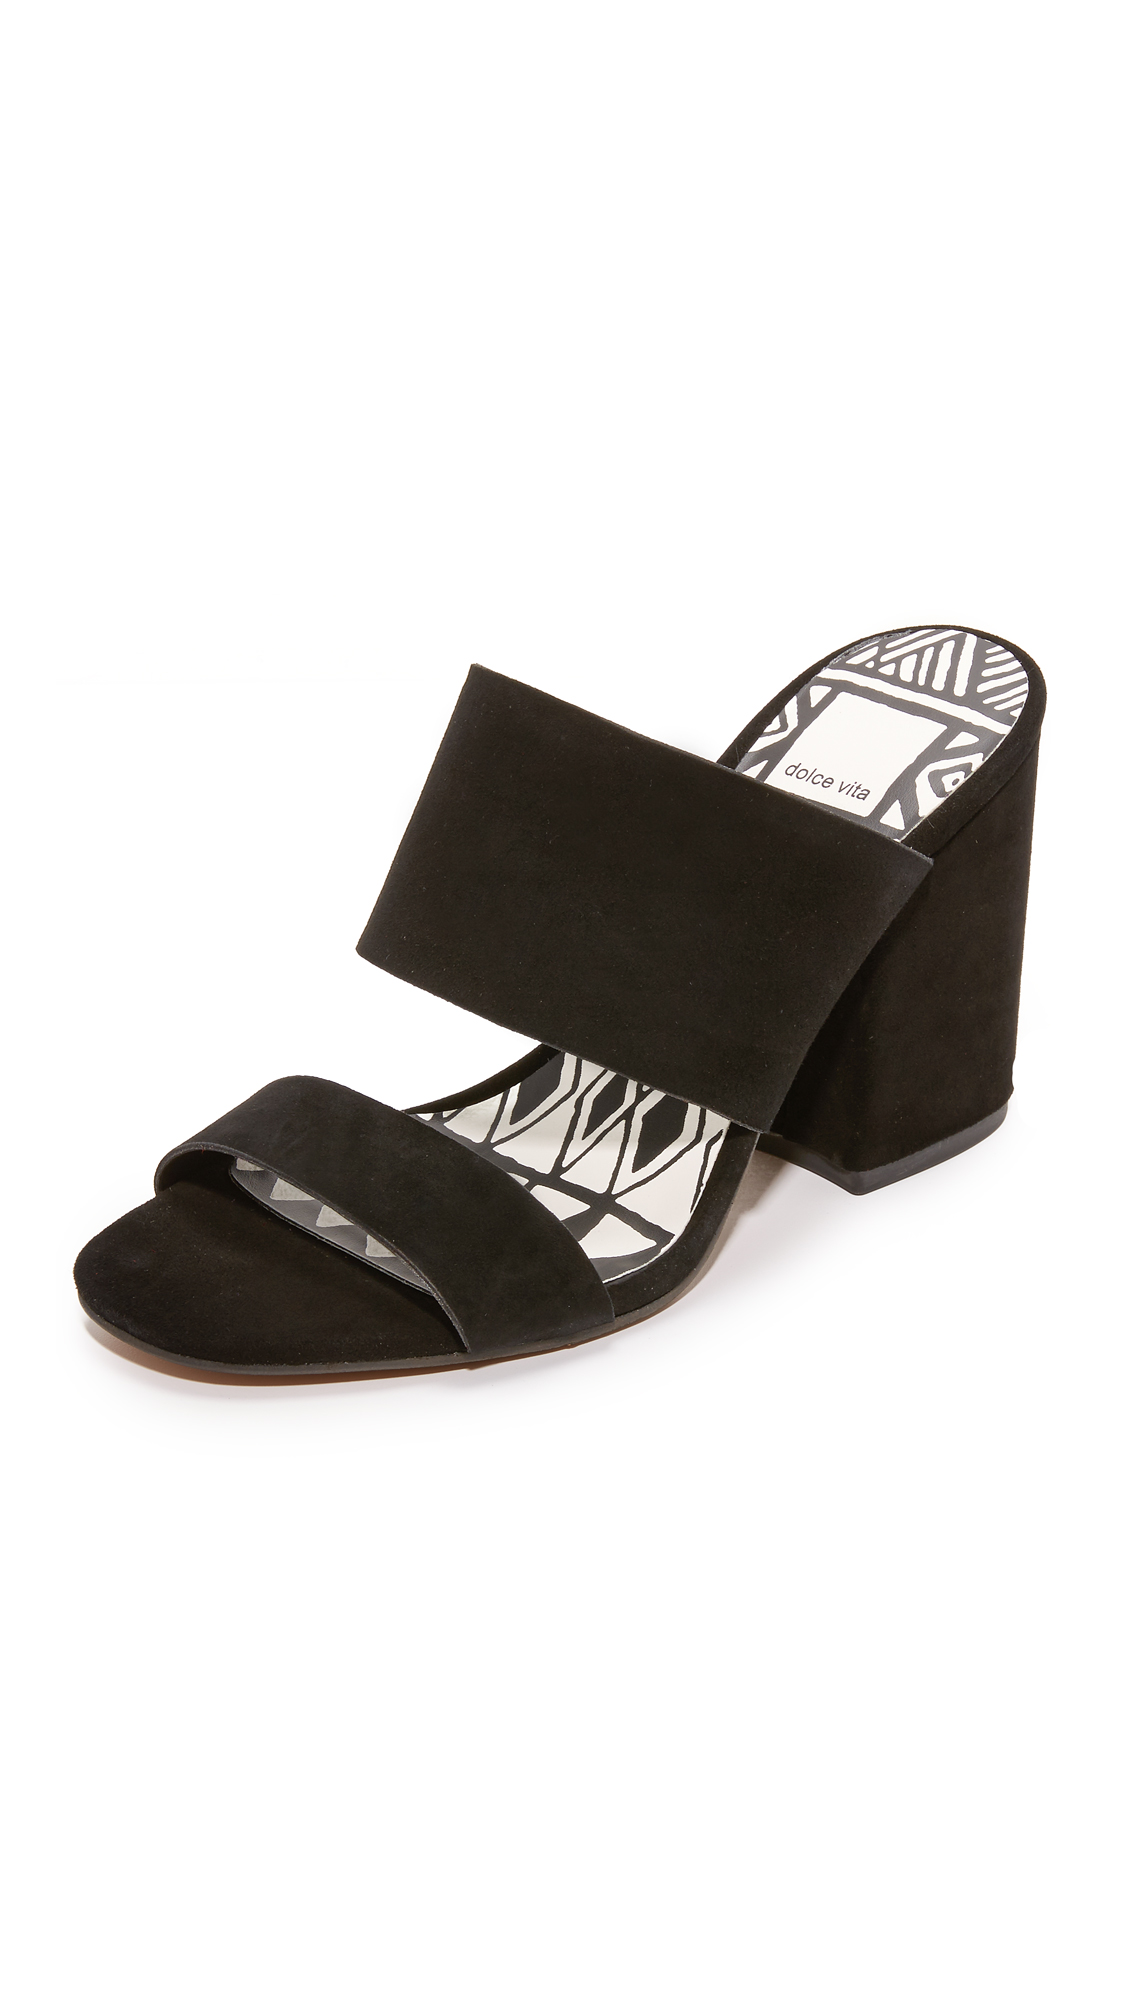 Dolce Vita Elize Mules - Black at Shopbop